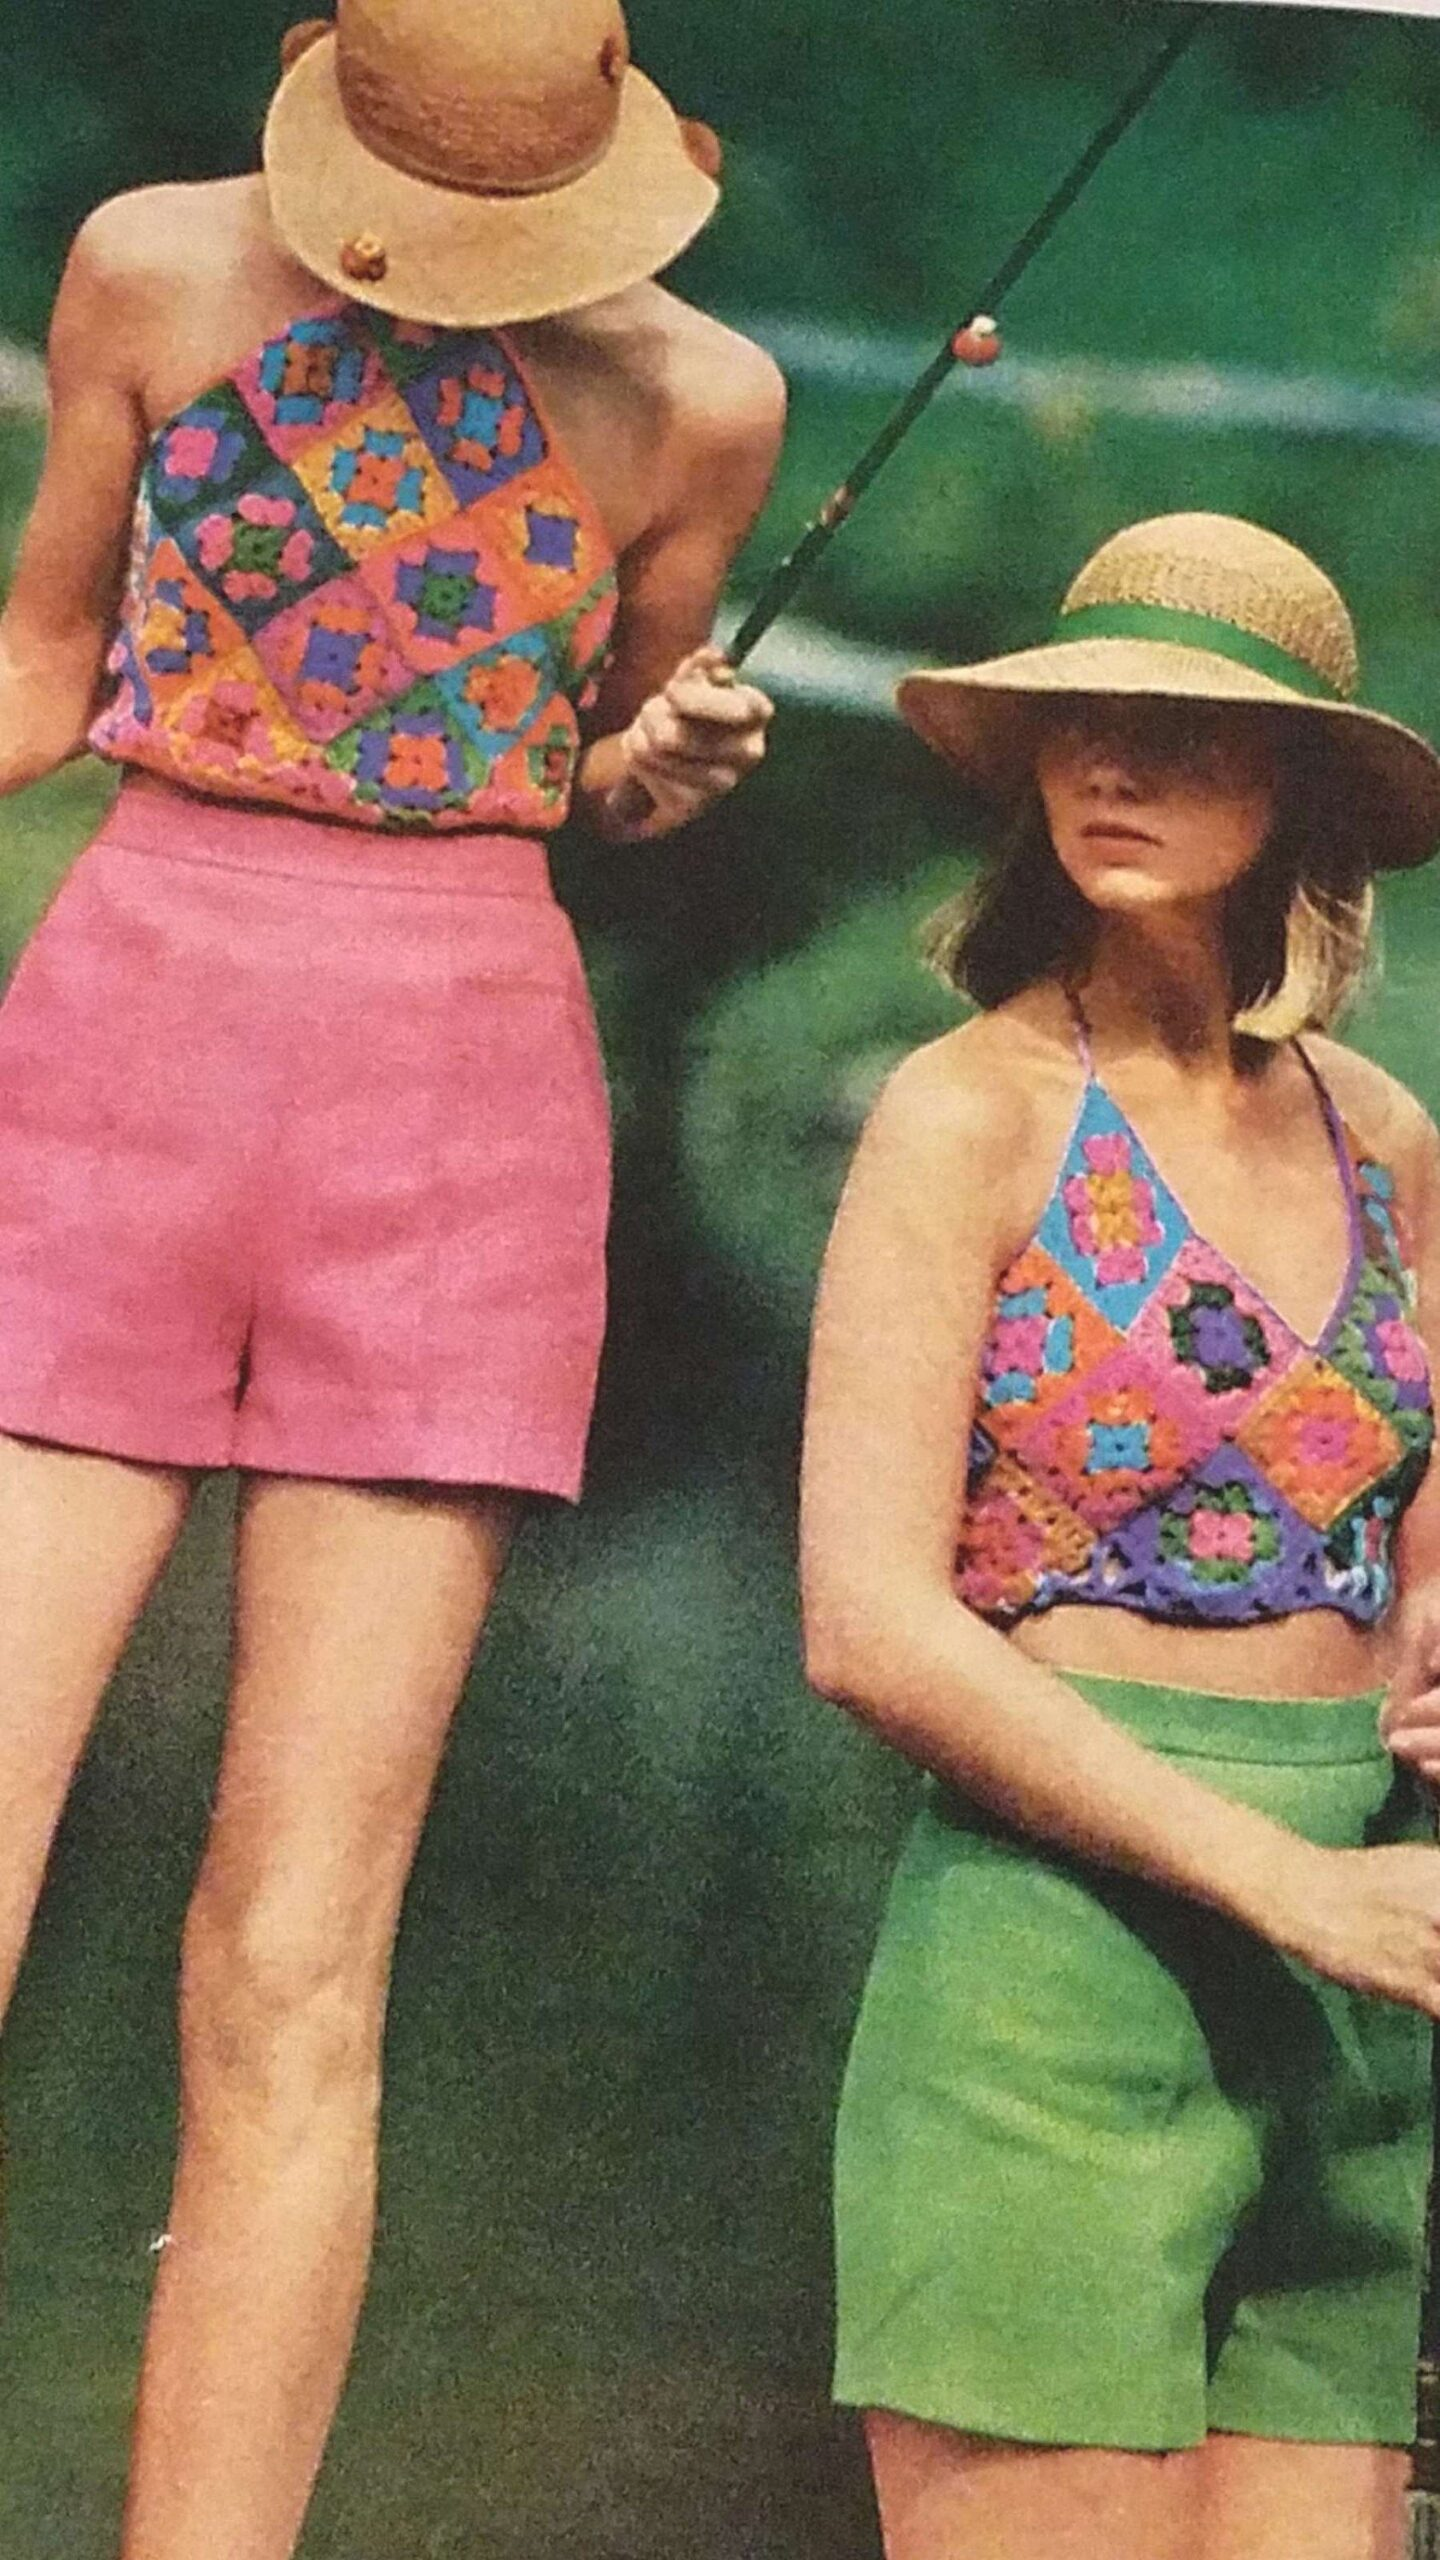 Crochet granny square set of 2 tops vintage pattern 1970s summer